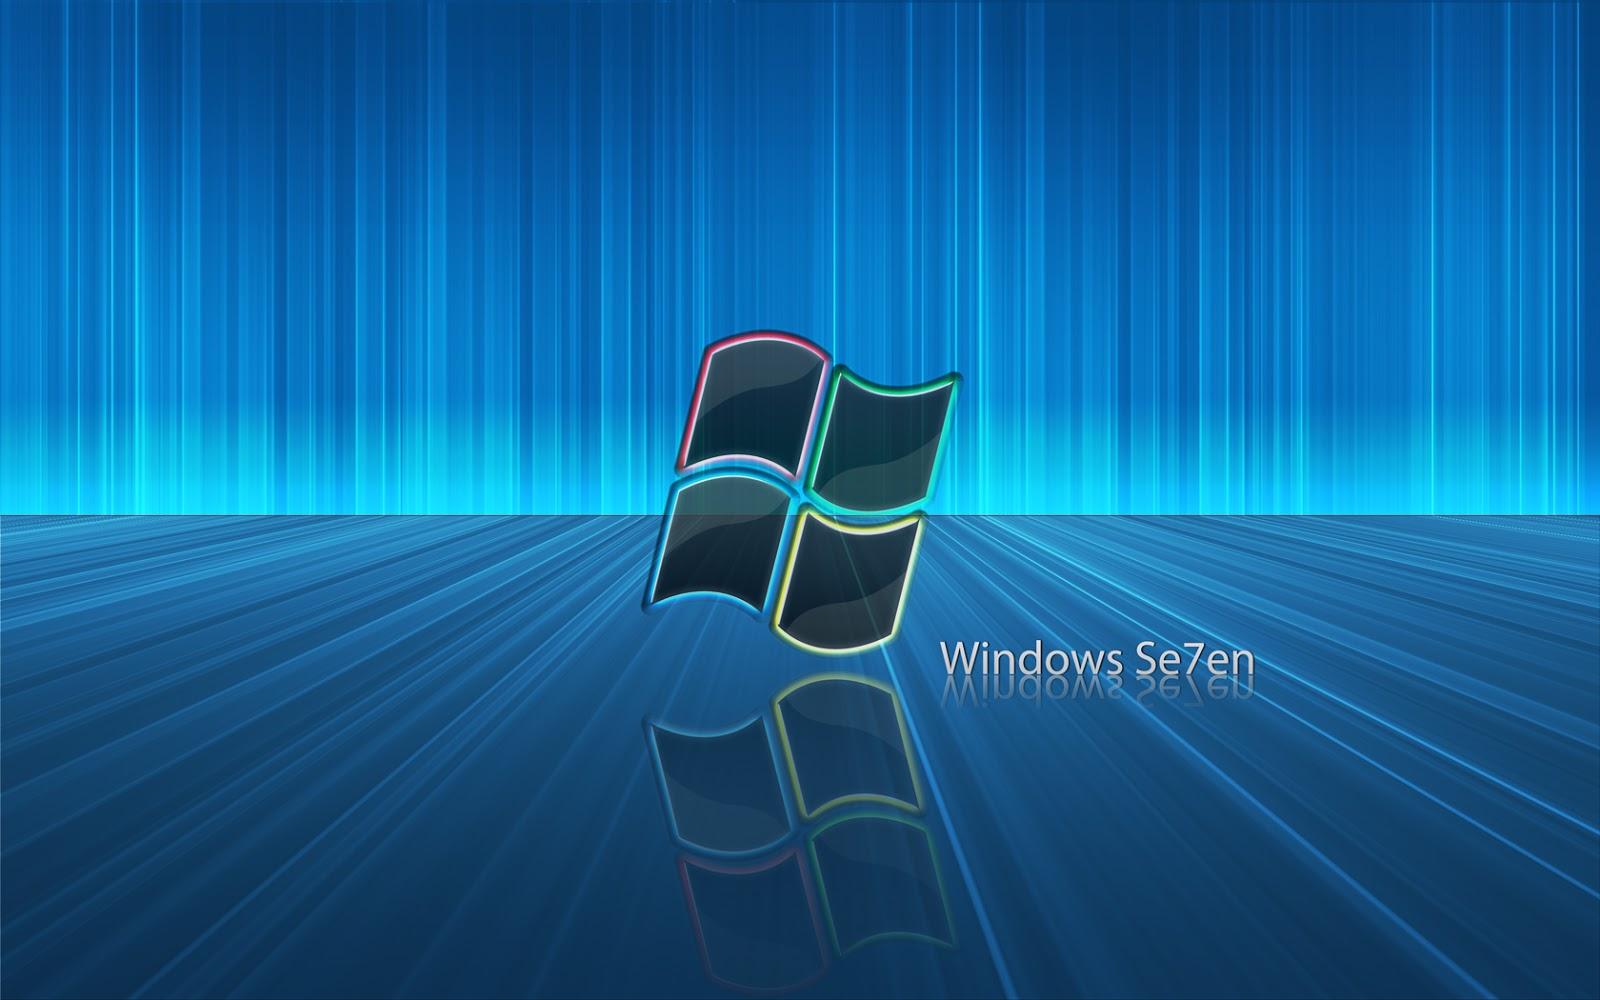 Windows 7 Whacked Wallpaper: Microsoft Wallpapers Windows 7